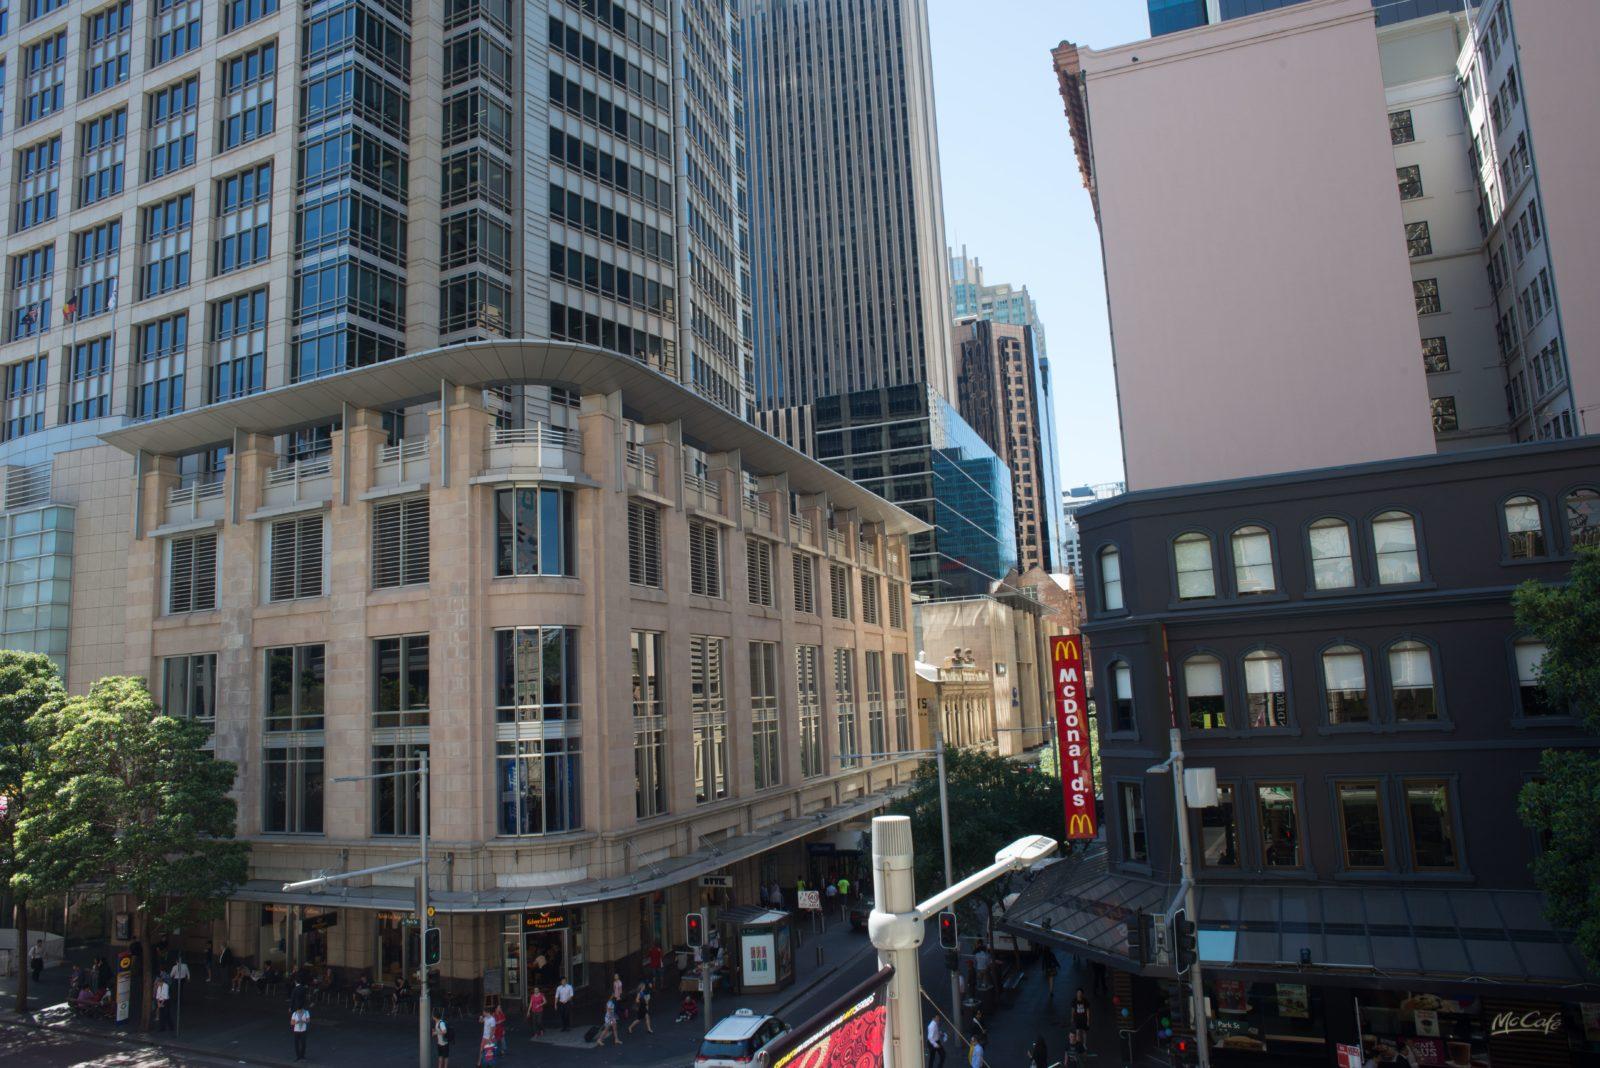 Criterion Hotel Sydney - View